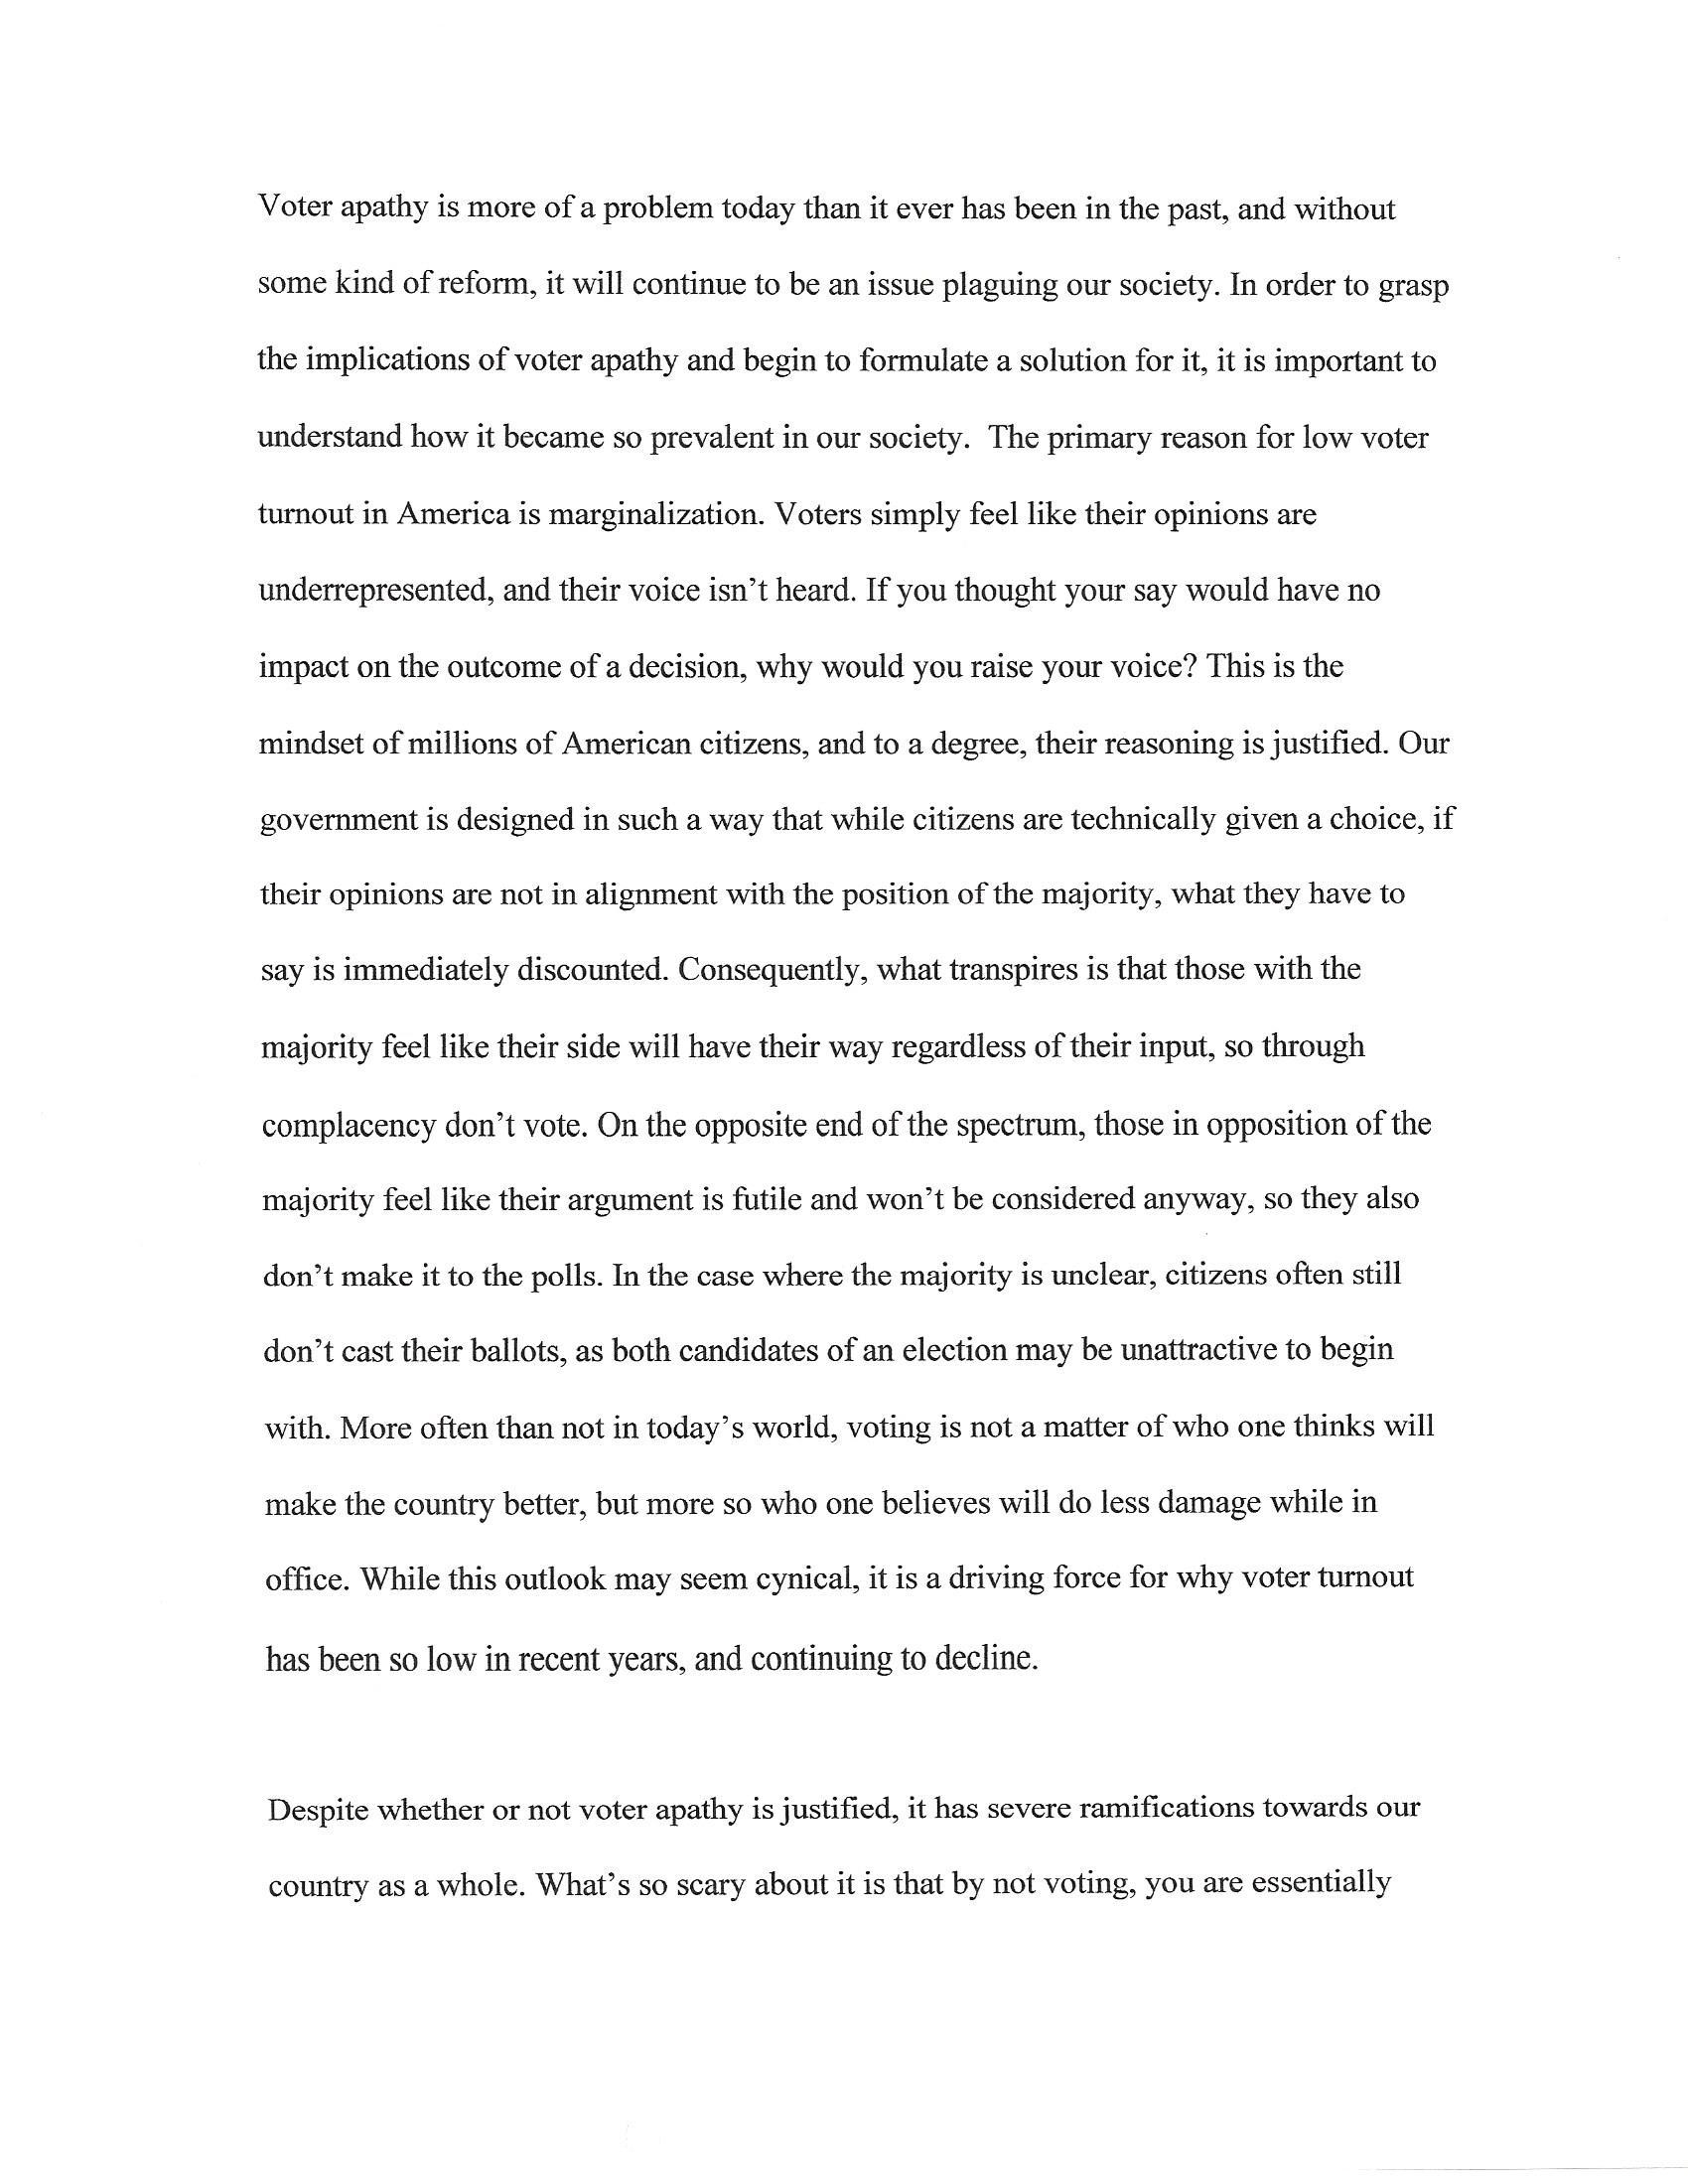 Buy nursing argumentative essay order professional cheap essay on presidential elections